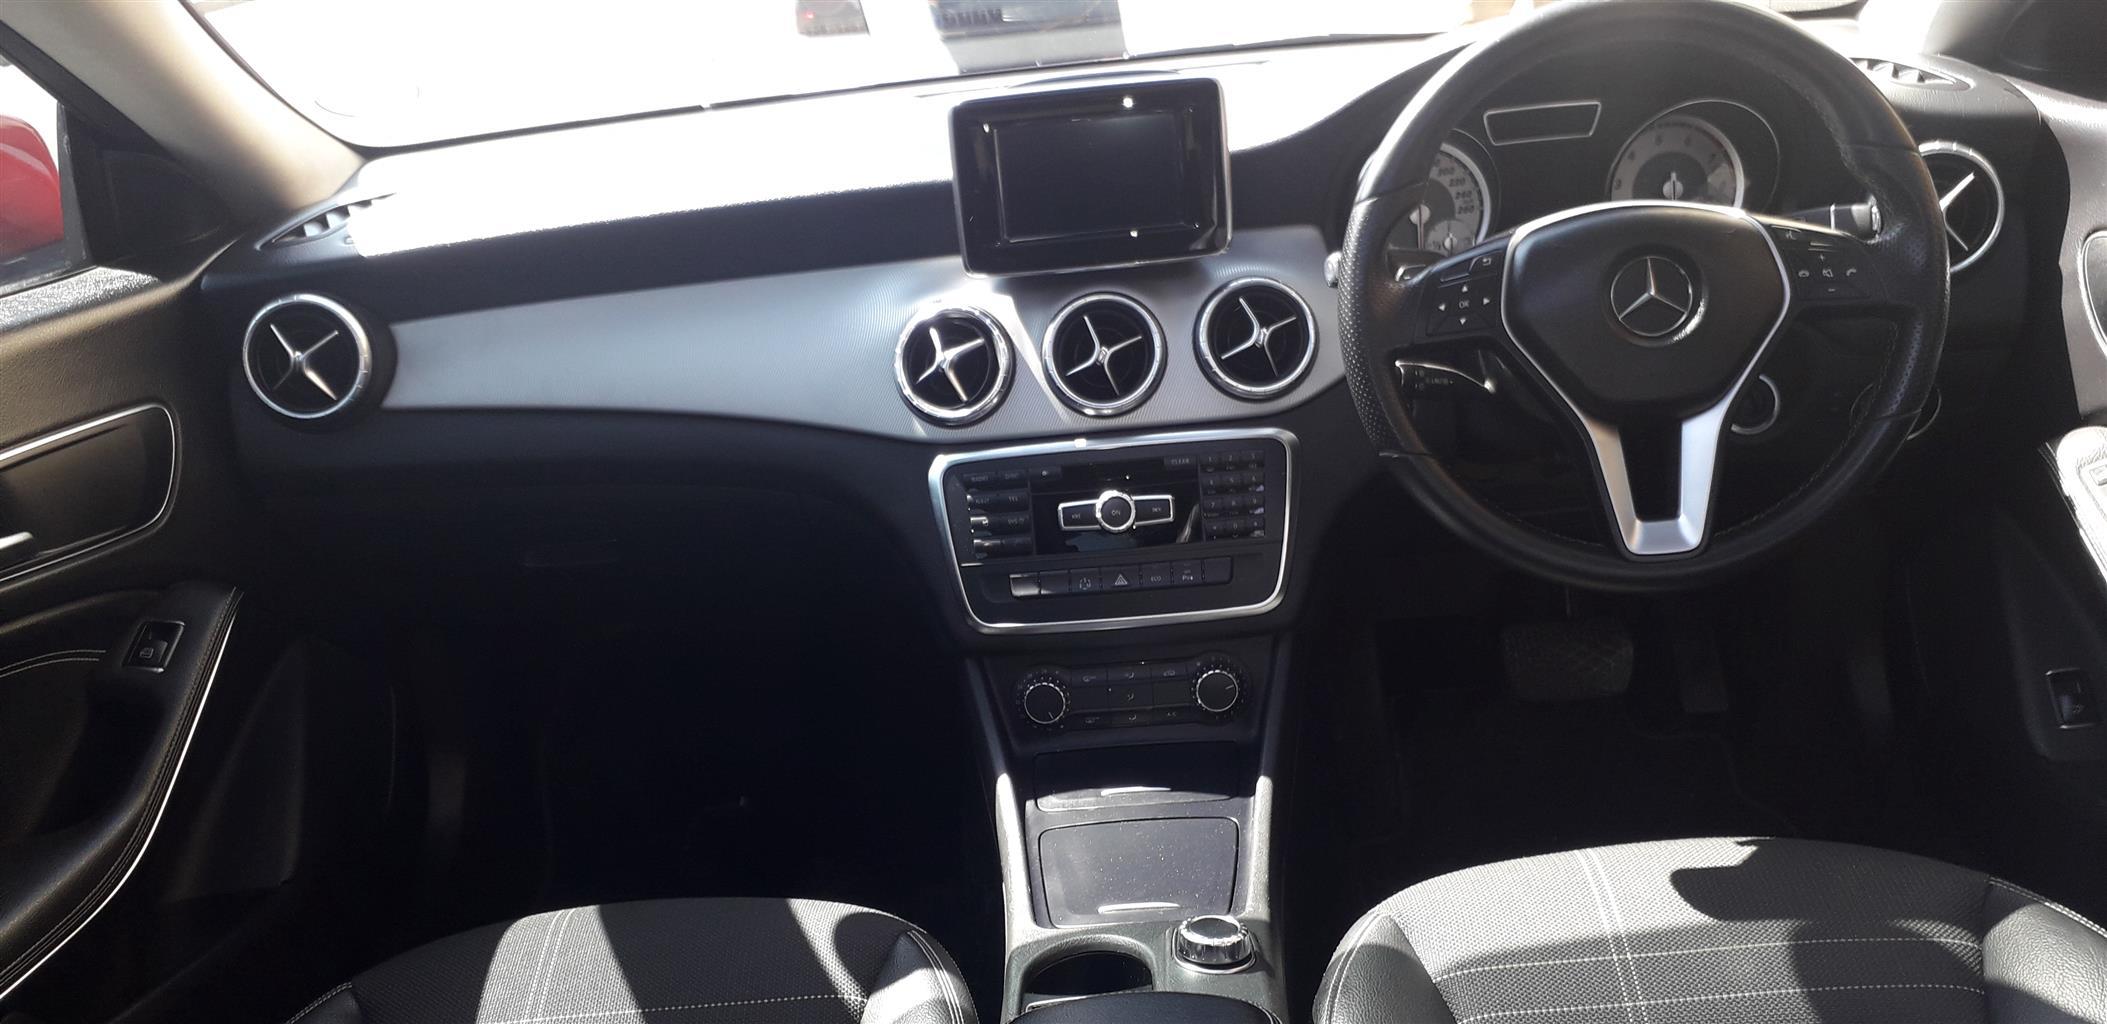 2013 Mercedes Benz CLA 200 AMG A/T